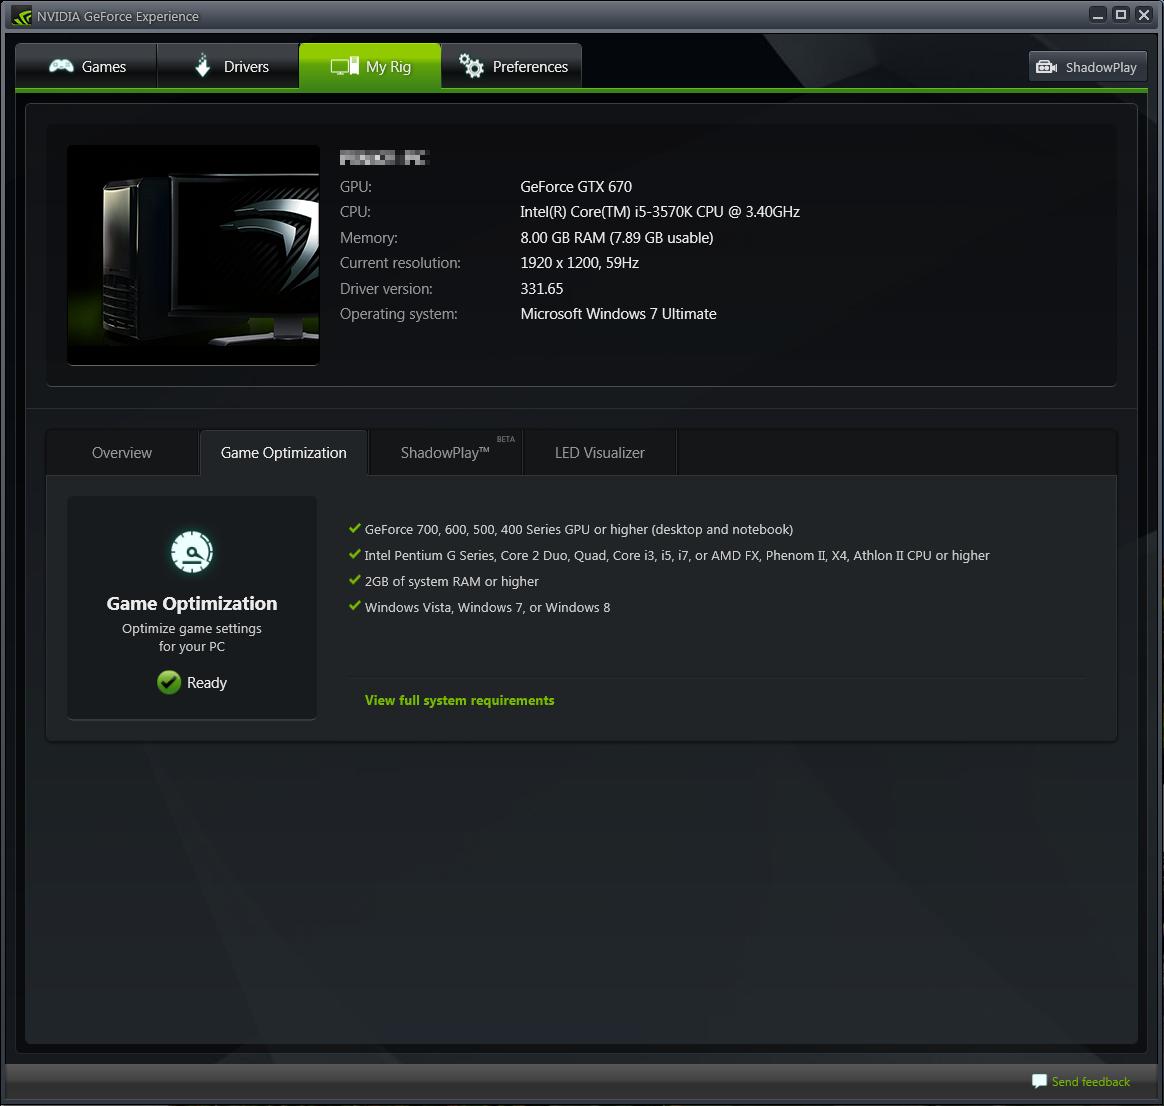 screenshot.Nvidia.GeForce.Experience 4 نرم افزار بهینه سازی بازی ها Nvidia GeForce Experience 2 0 0 0